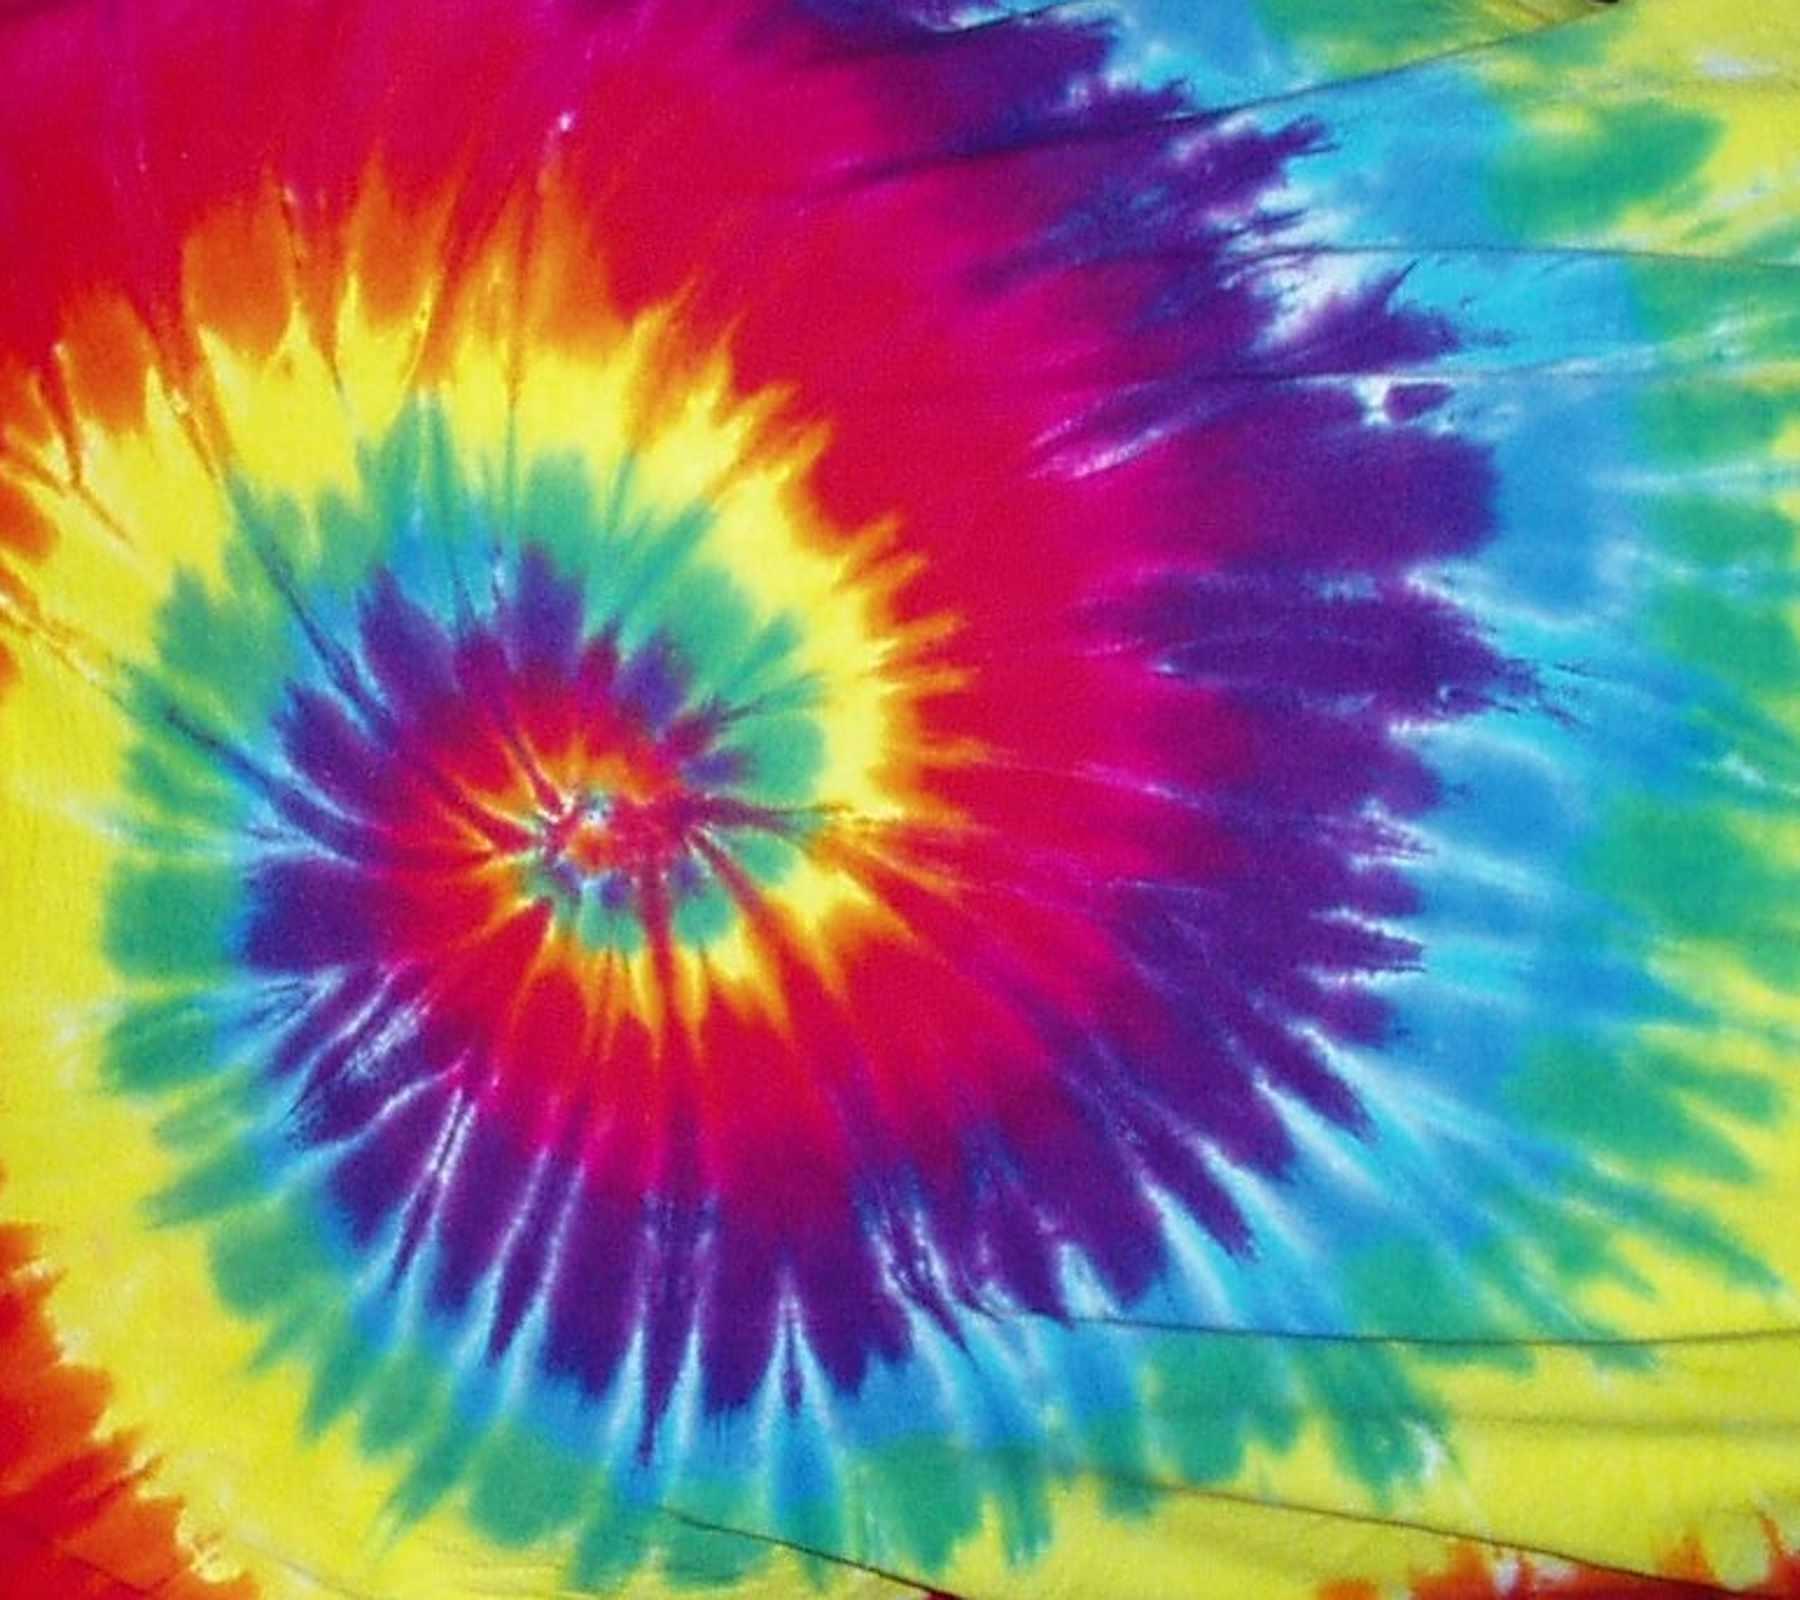 Pastel Rainbow Tie Dye